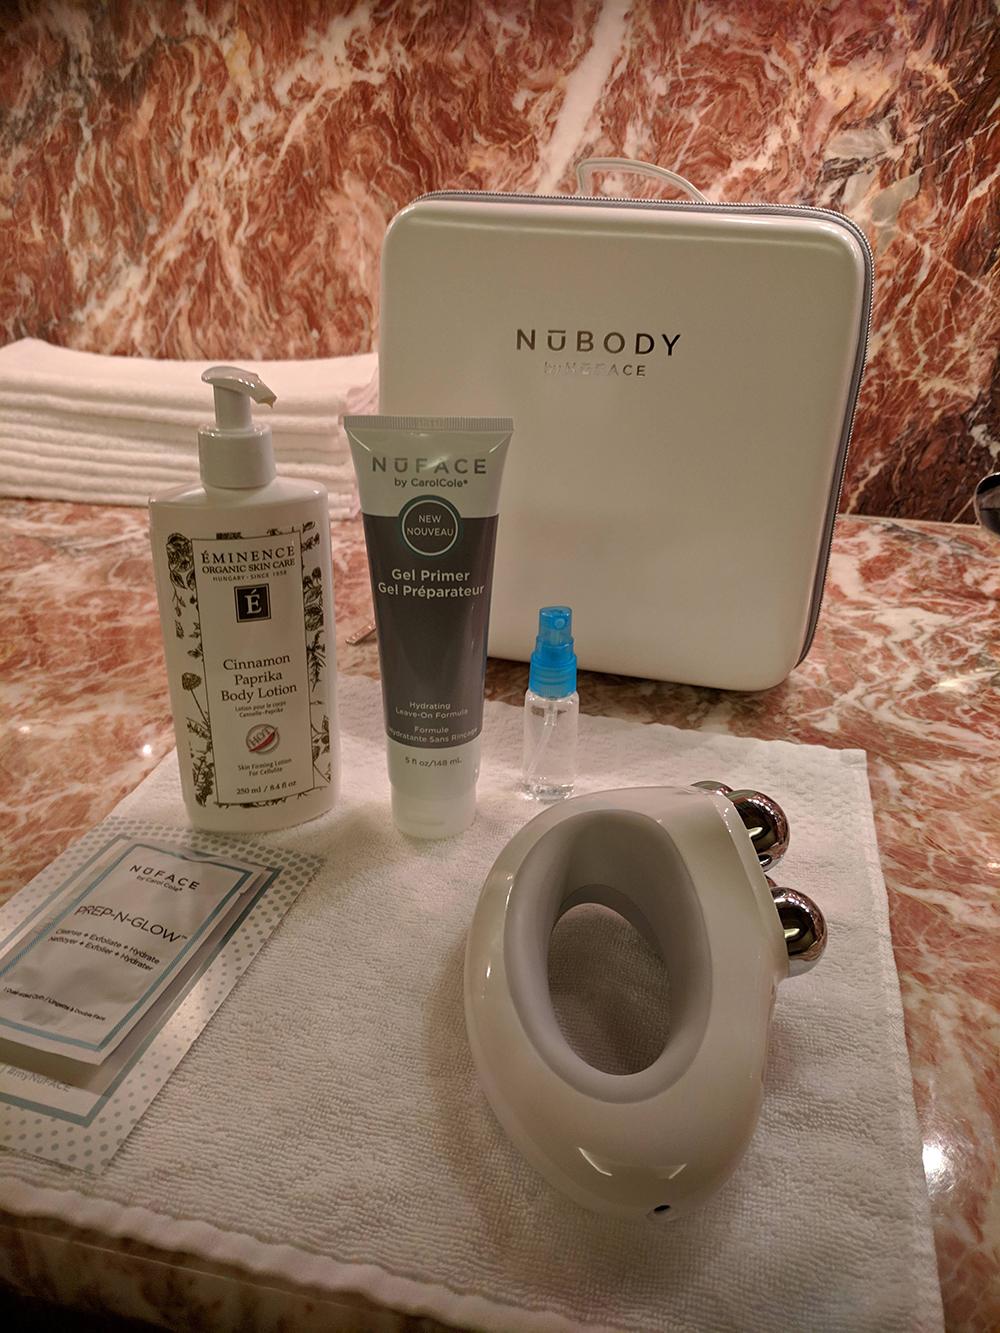 Microcurrent setup using the NuBody toning device.